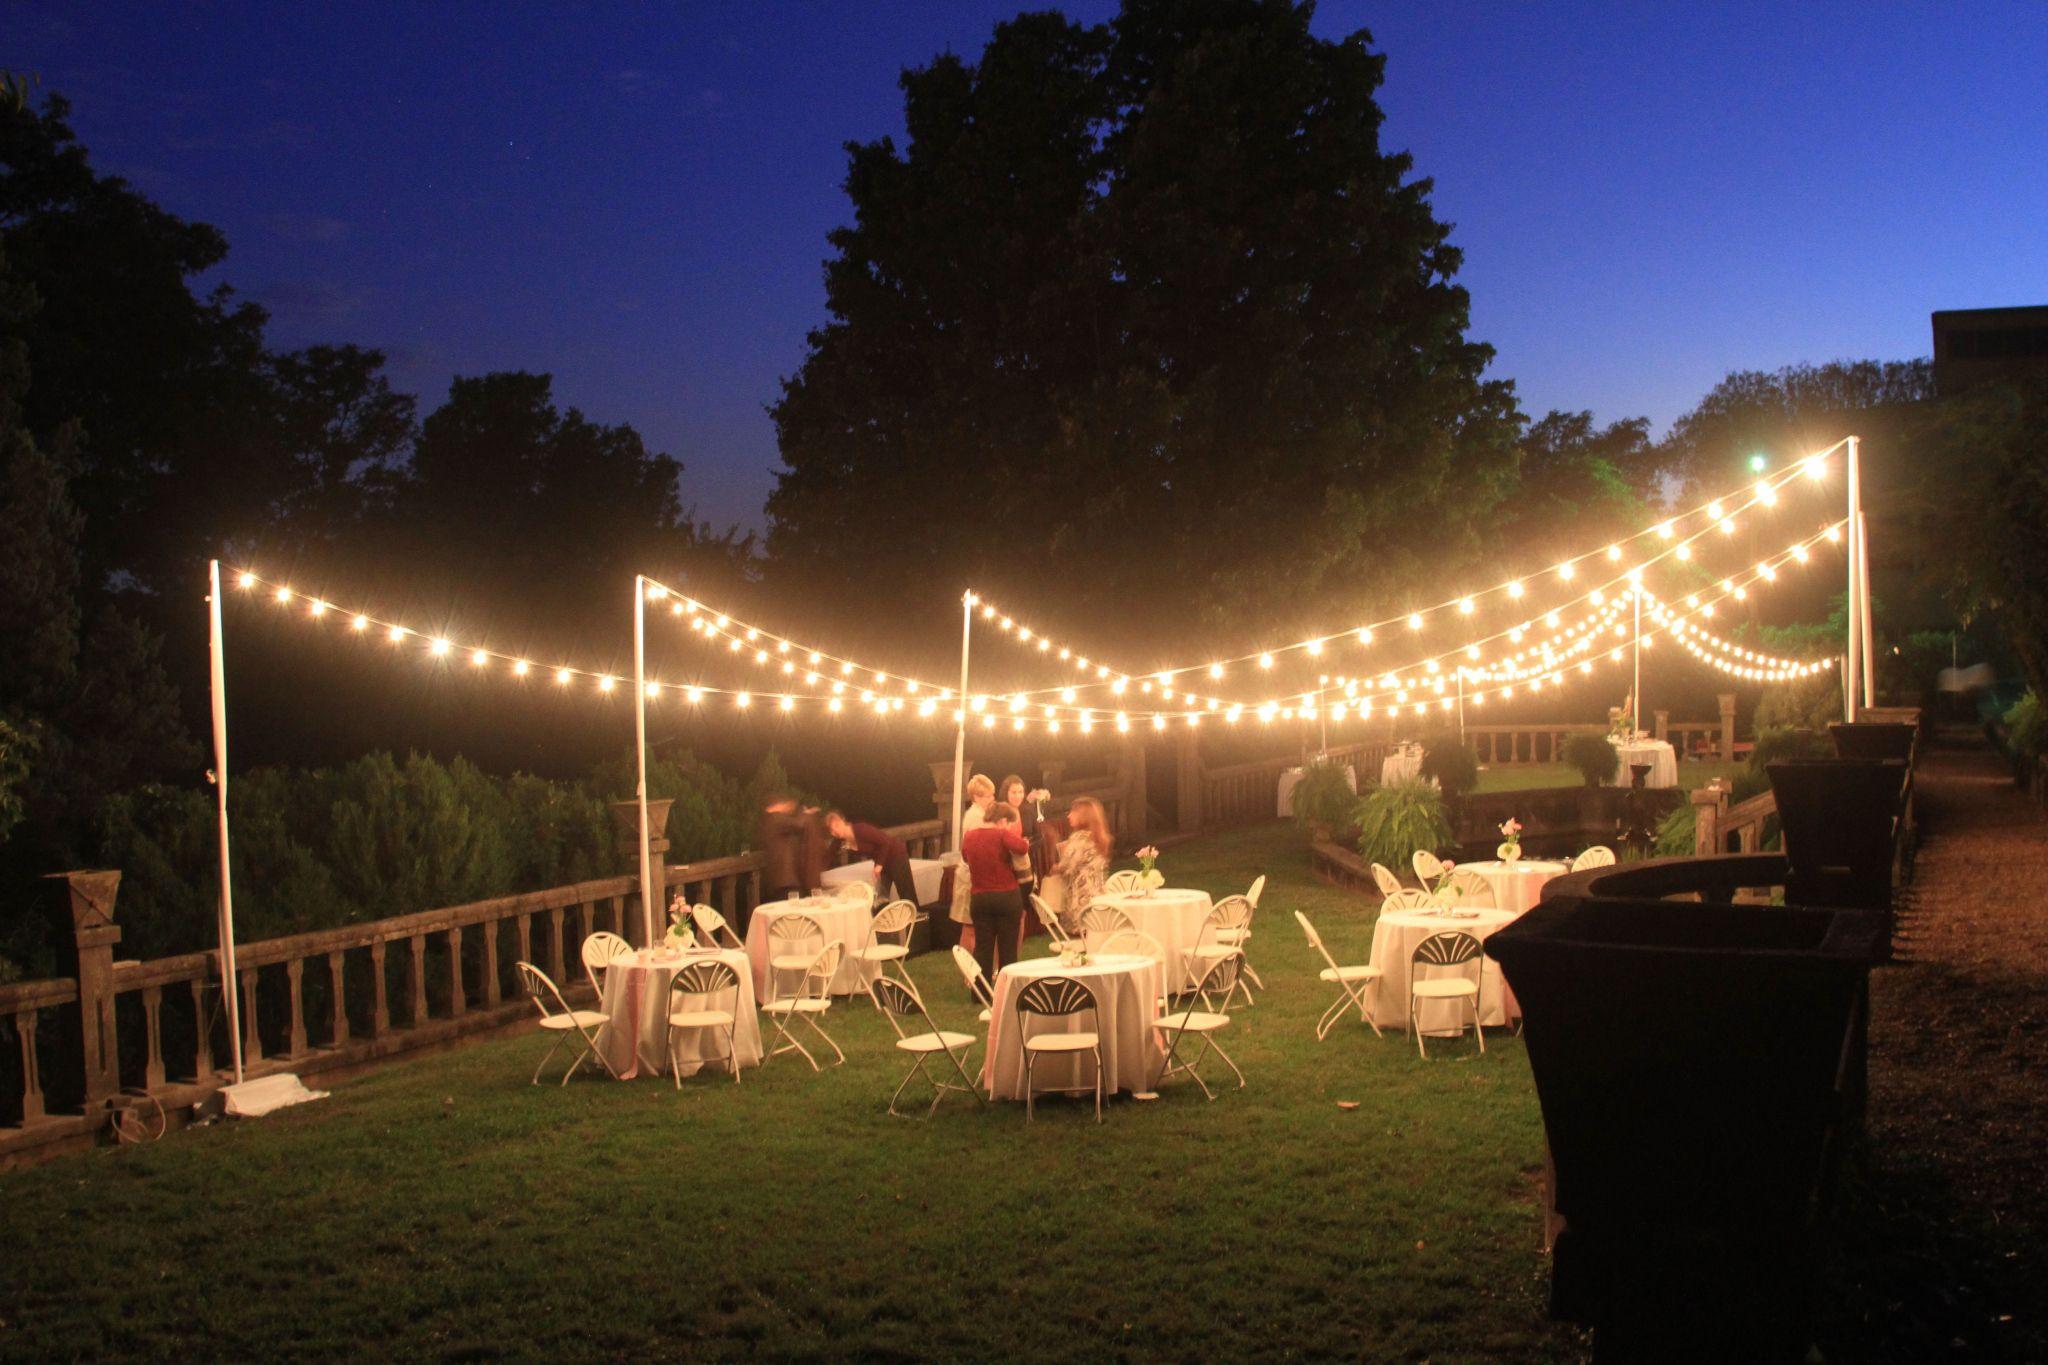 Outdoor Wedding Lighting Ideas Best Paint For Interior Walls Check